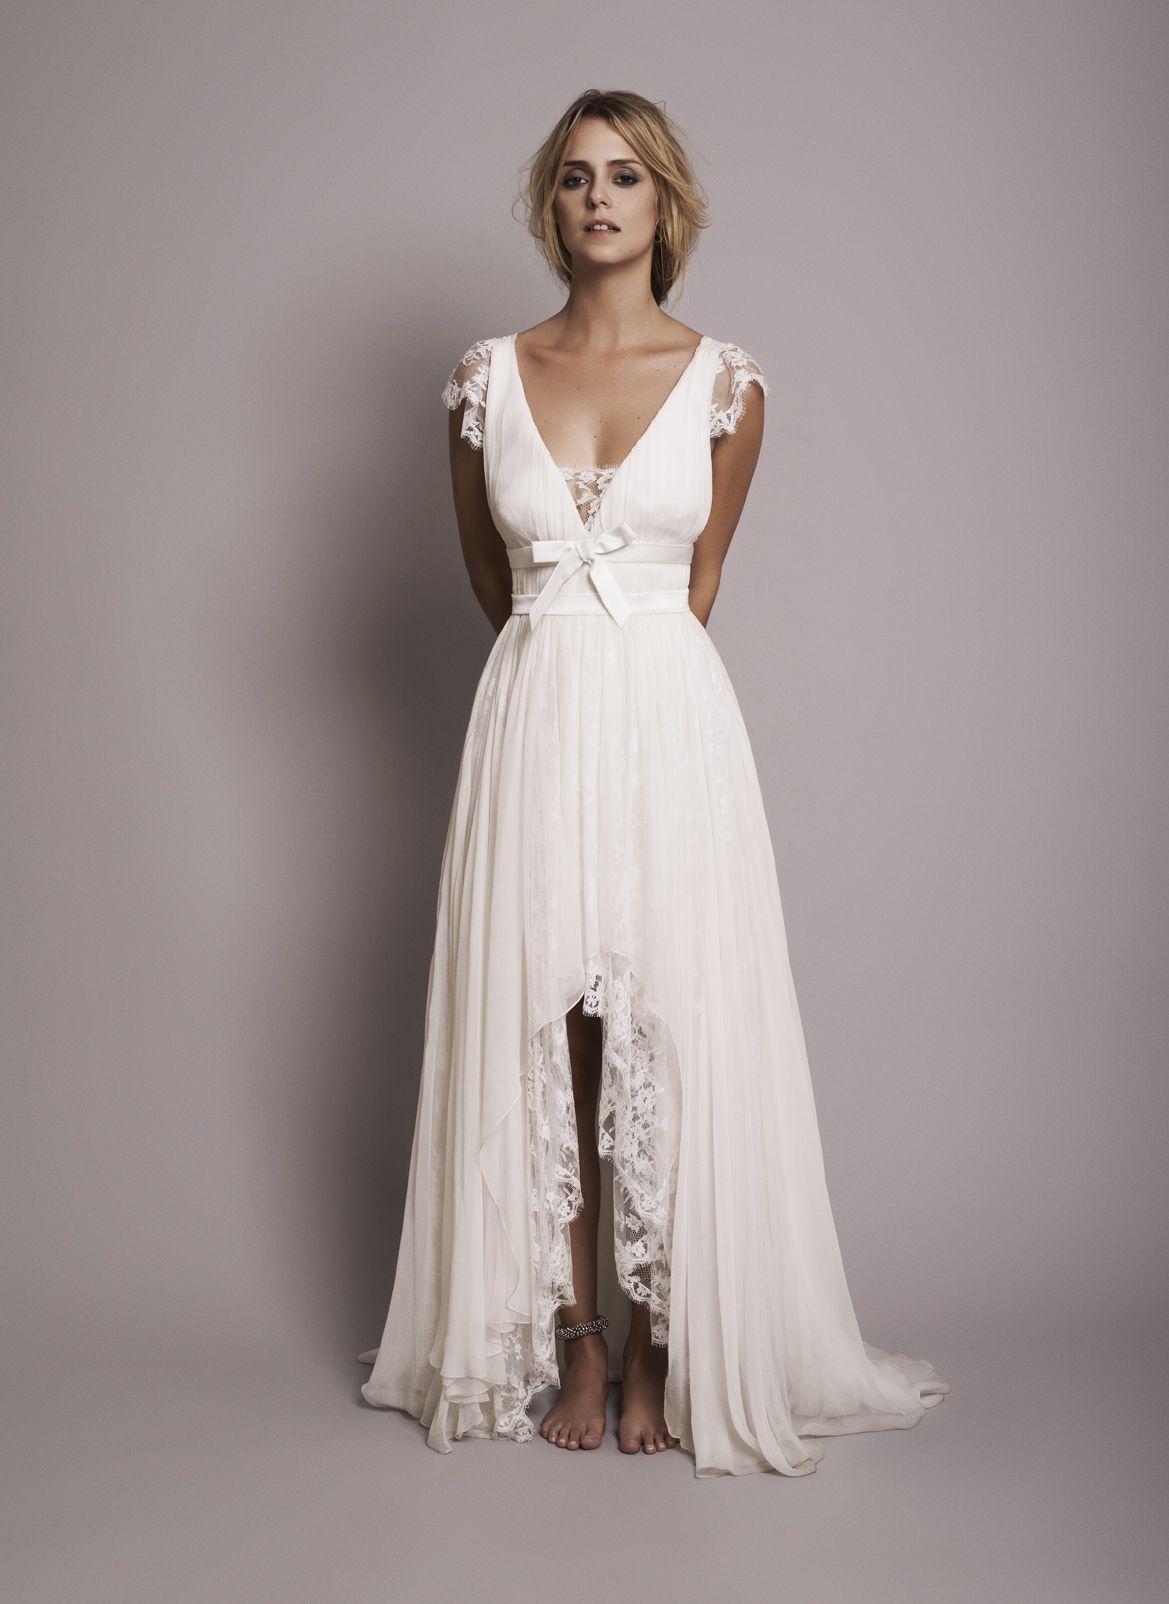 épinglé Par Kieran Kirk Sur Wedding Dresseshair I Love